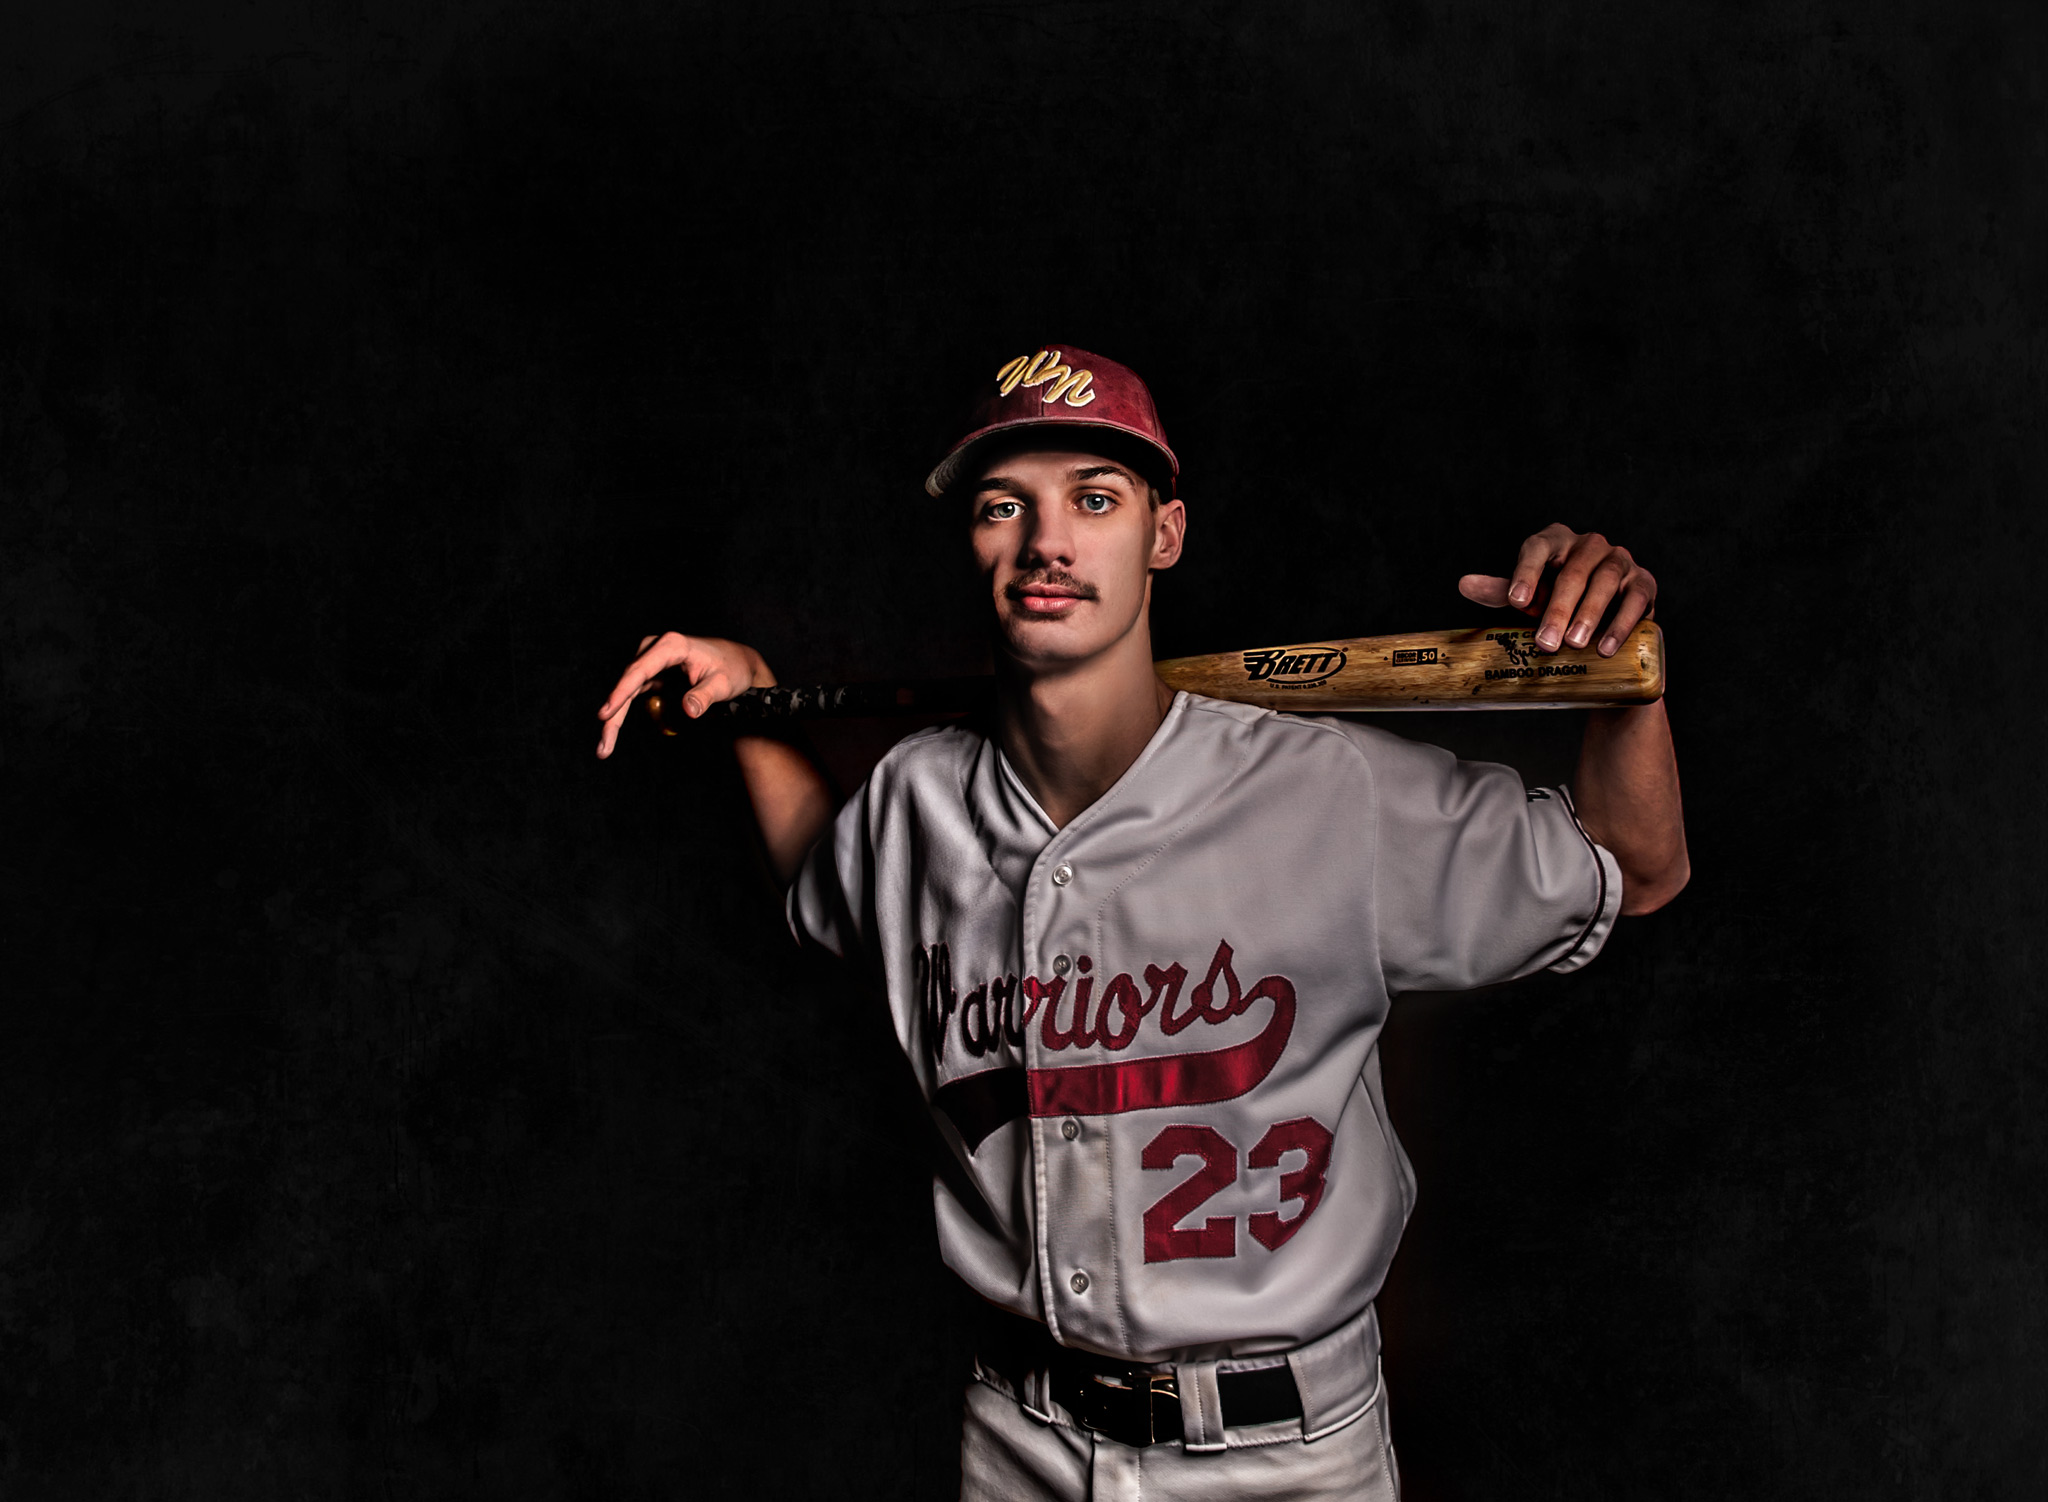 highschool-senior-baseball-photo-westerville.jpg